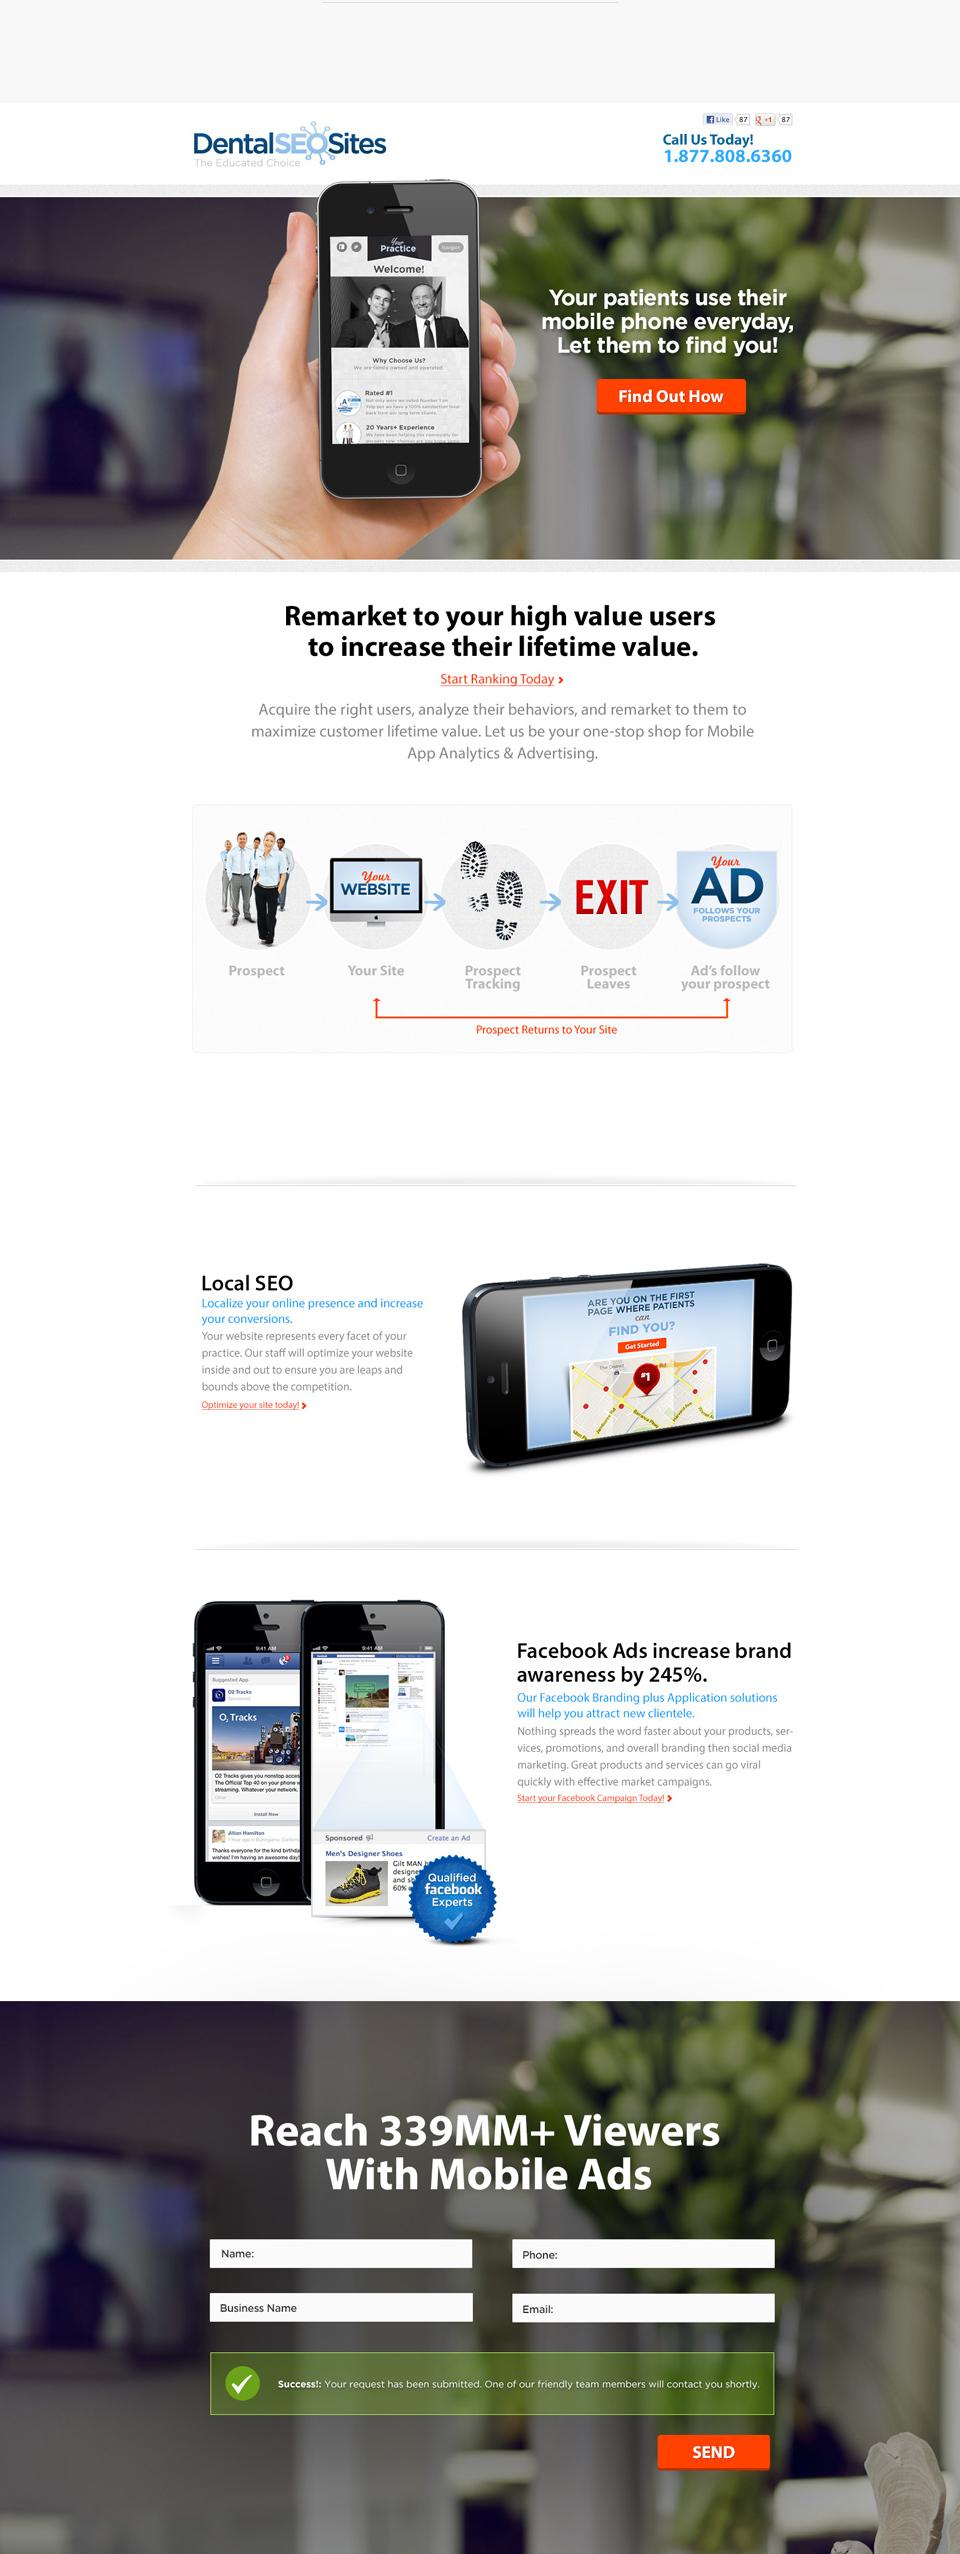 dentalseosites-landing-page